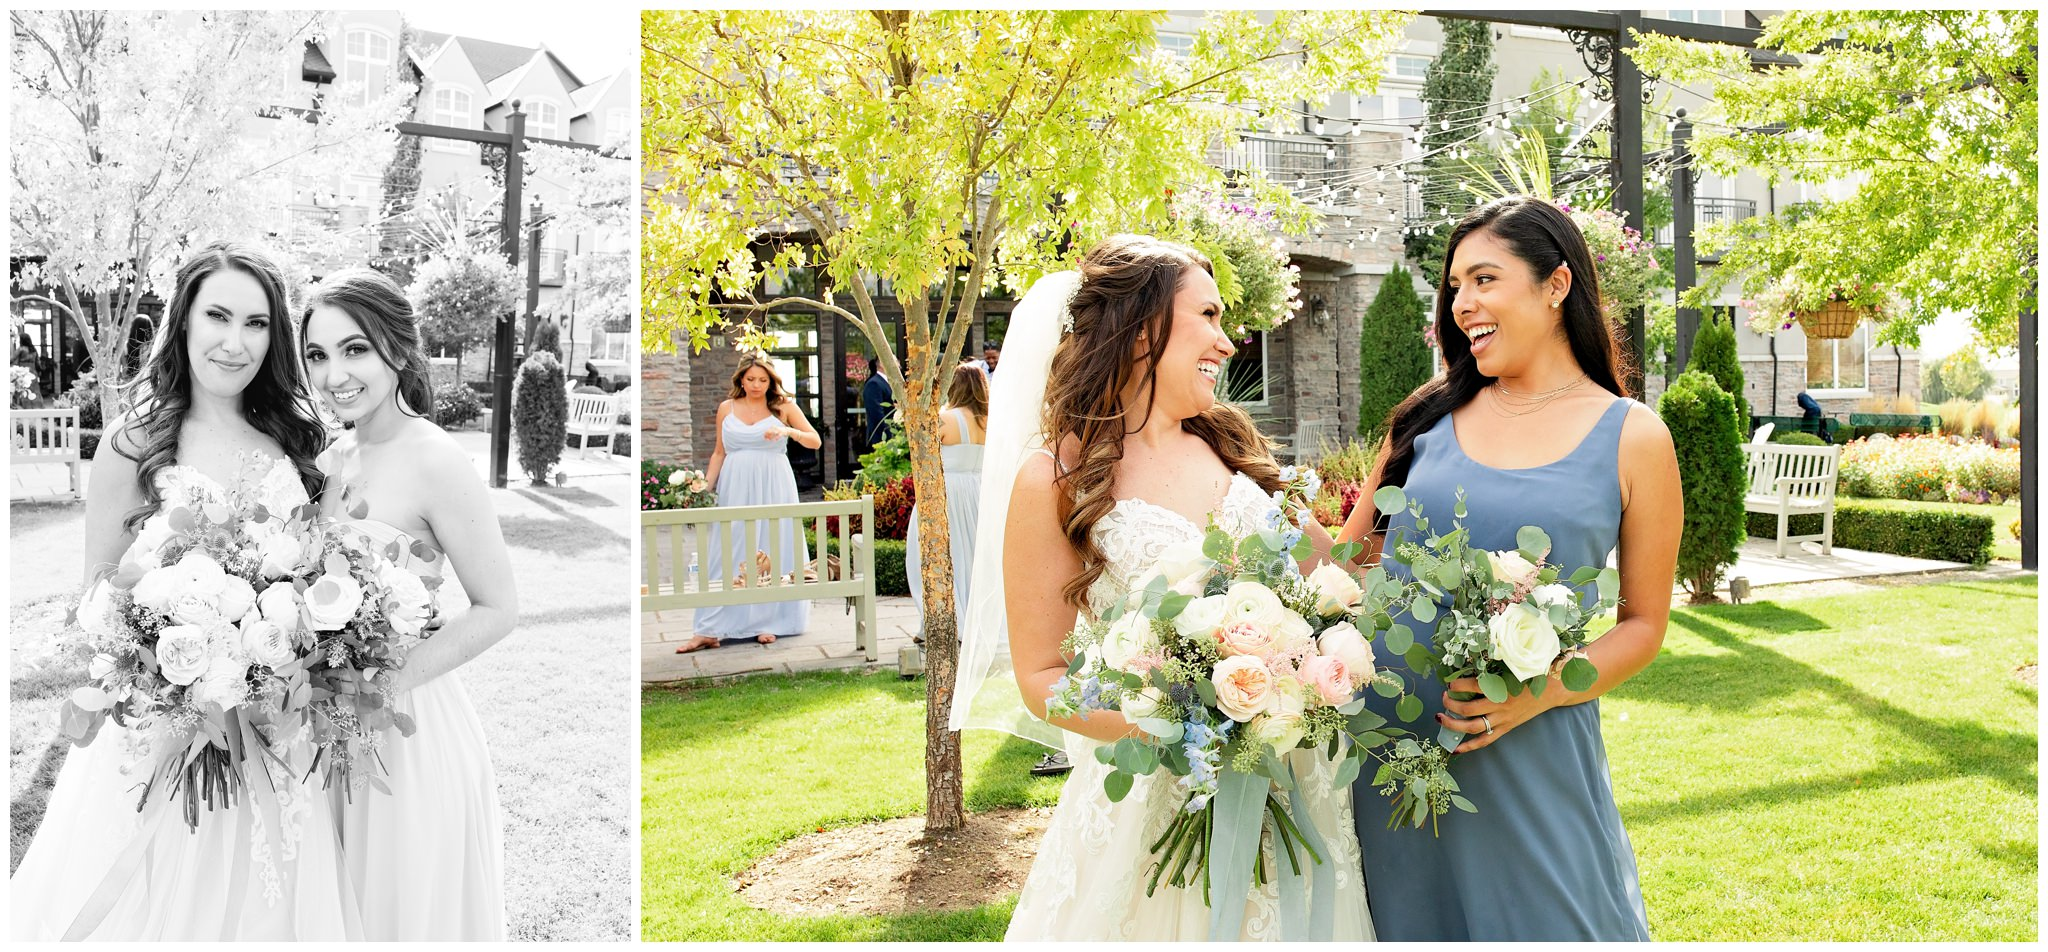 Bride and her best friends at wedding in Utah